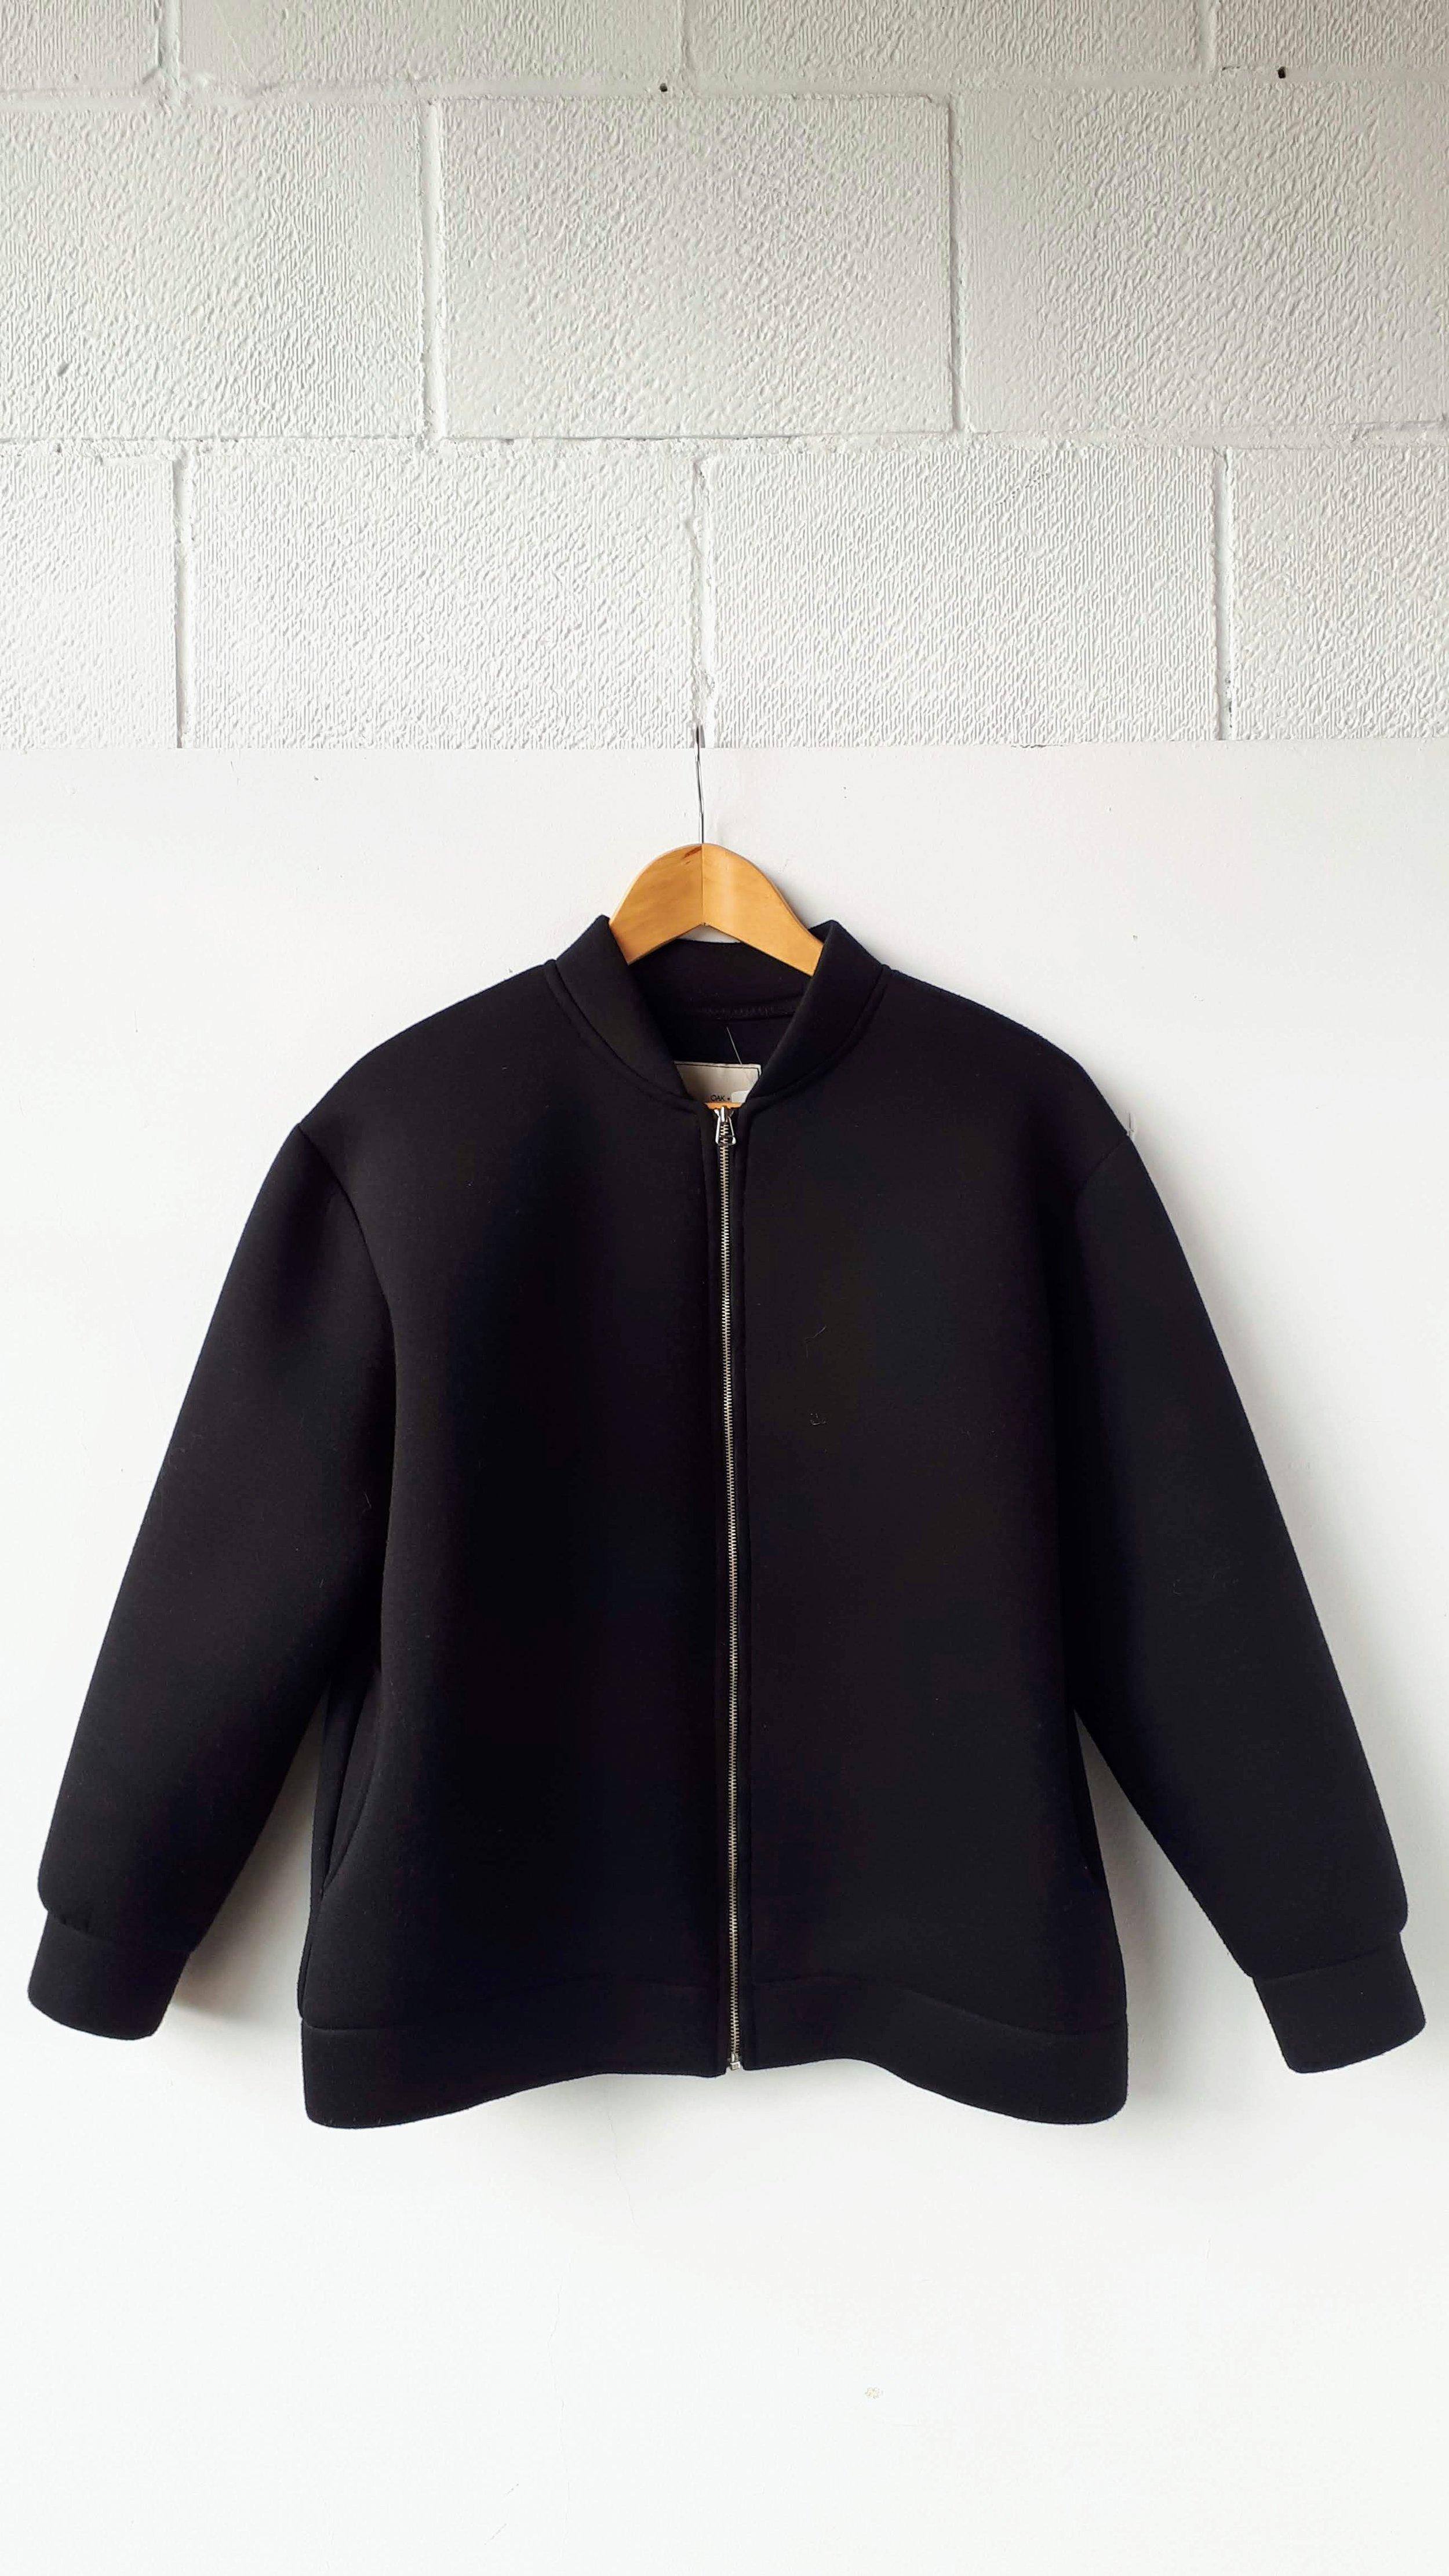 Oak+Fort jacket; Size M, $62